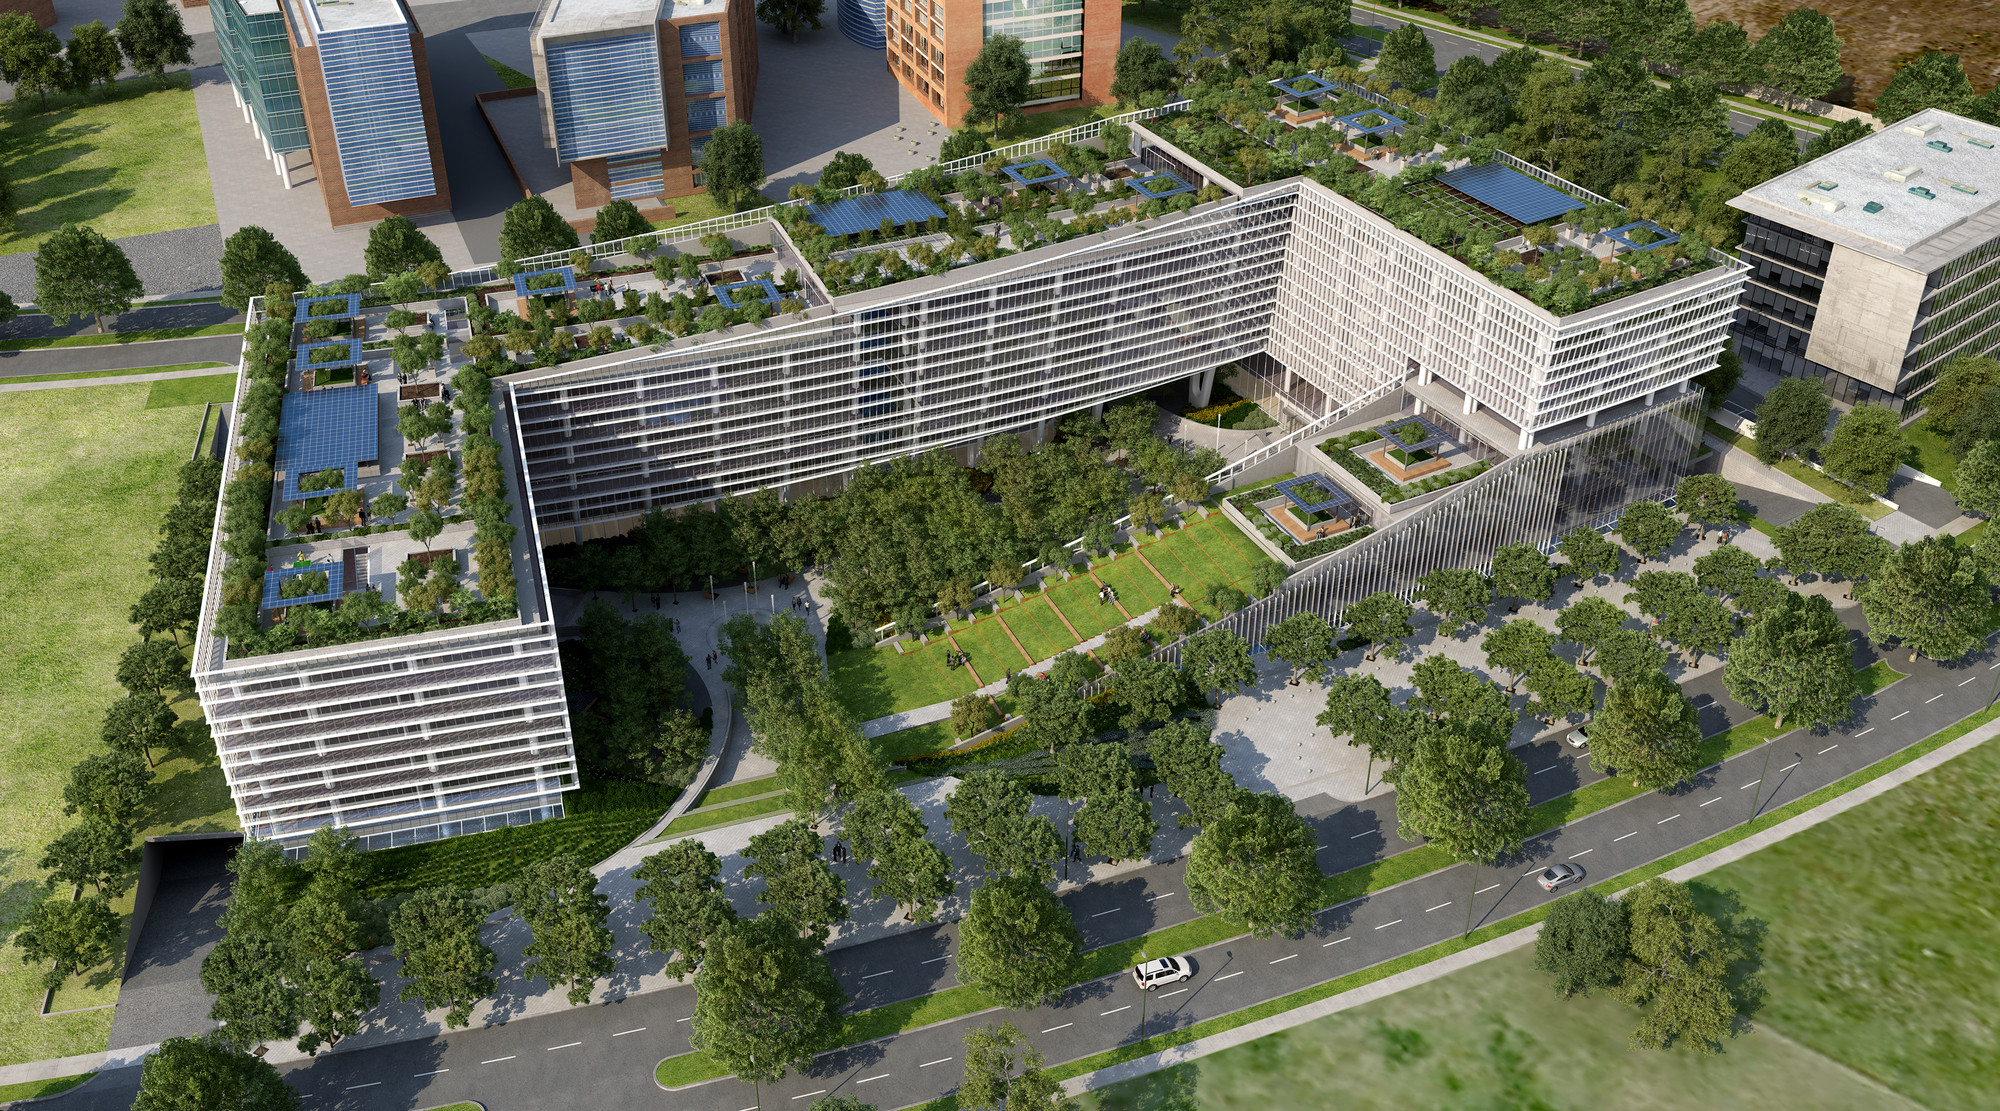 World Green Center / cCe arquitectos + Andreu arquitectos, Cortesia de cCe arquitectos + Andreu arquitectos